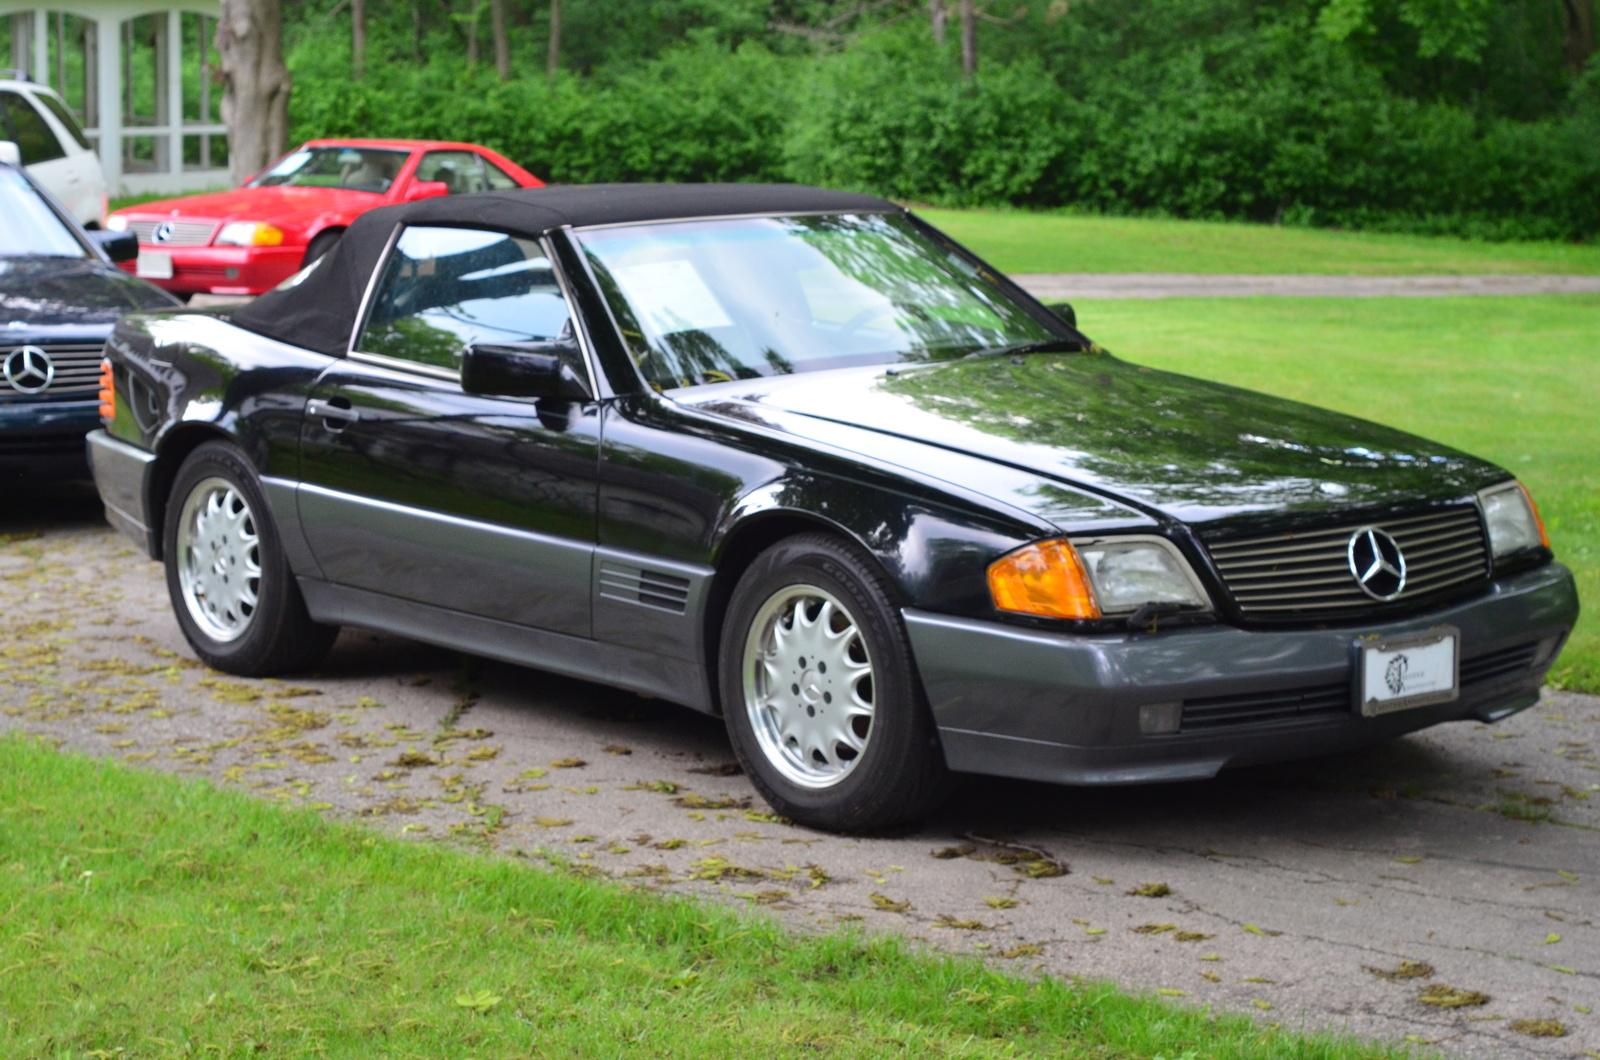 1991 mercedes benz 500 class pictures cargurus for 1991 mercedes benz 500sl convertible